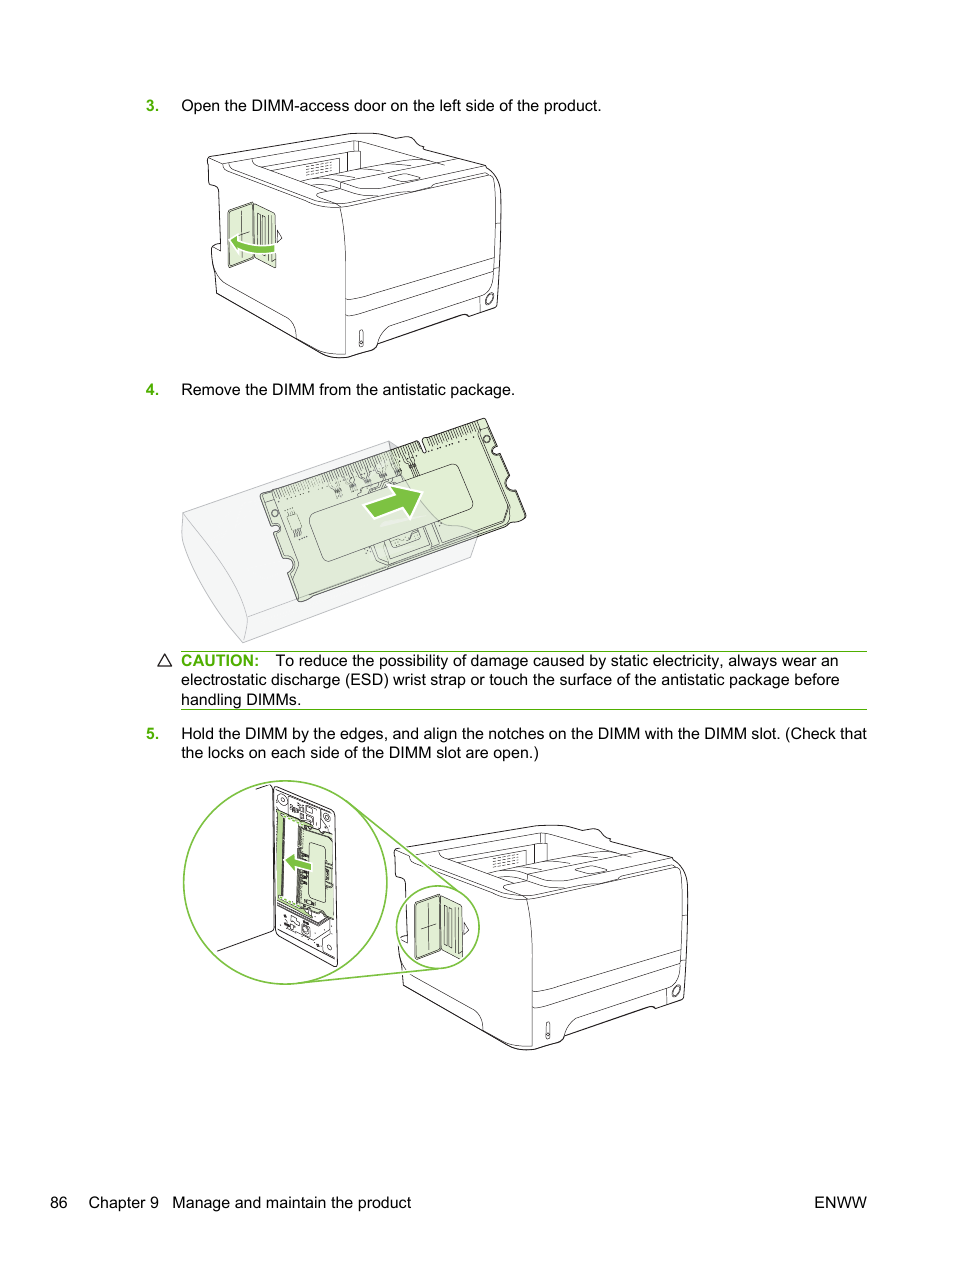 hp laserjet p2055dn user manual page 98 176 also for laserjet rh manualsdir com service manual laserjet p2055 manual hp laserjet p2055dn